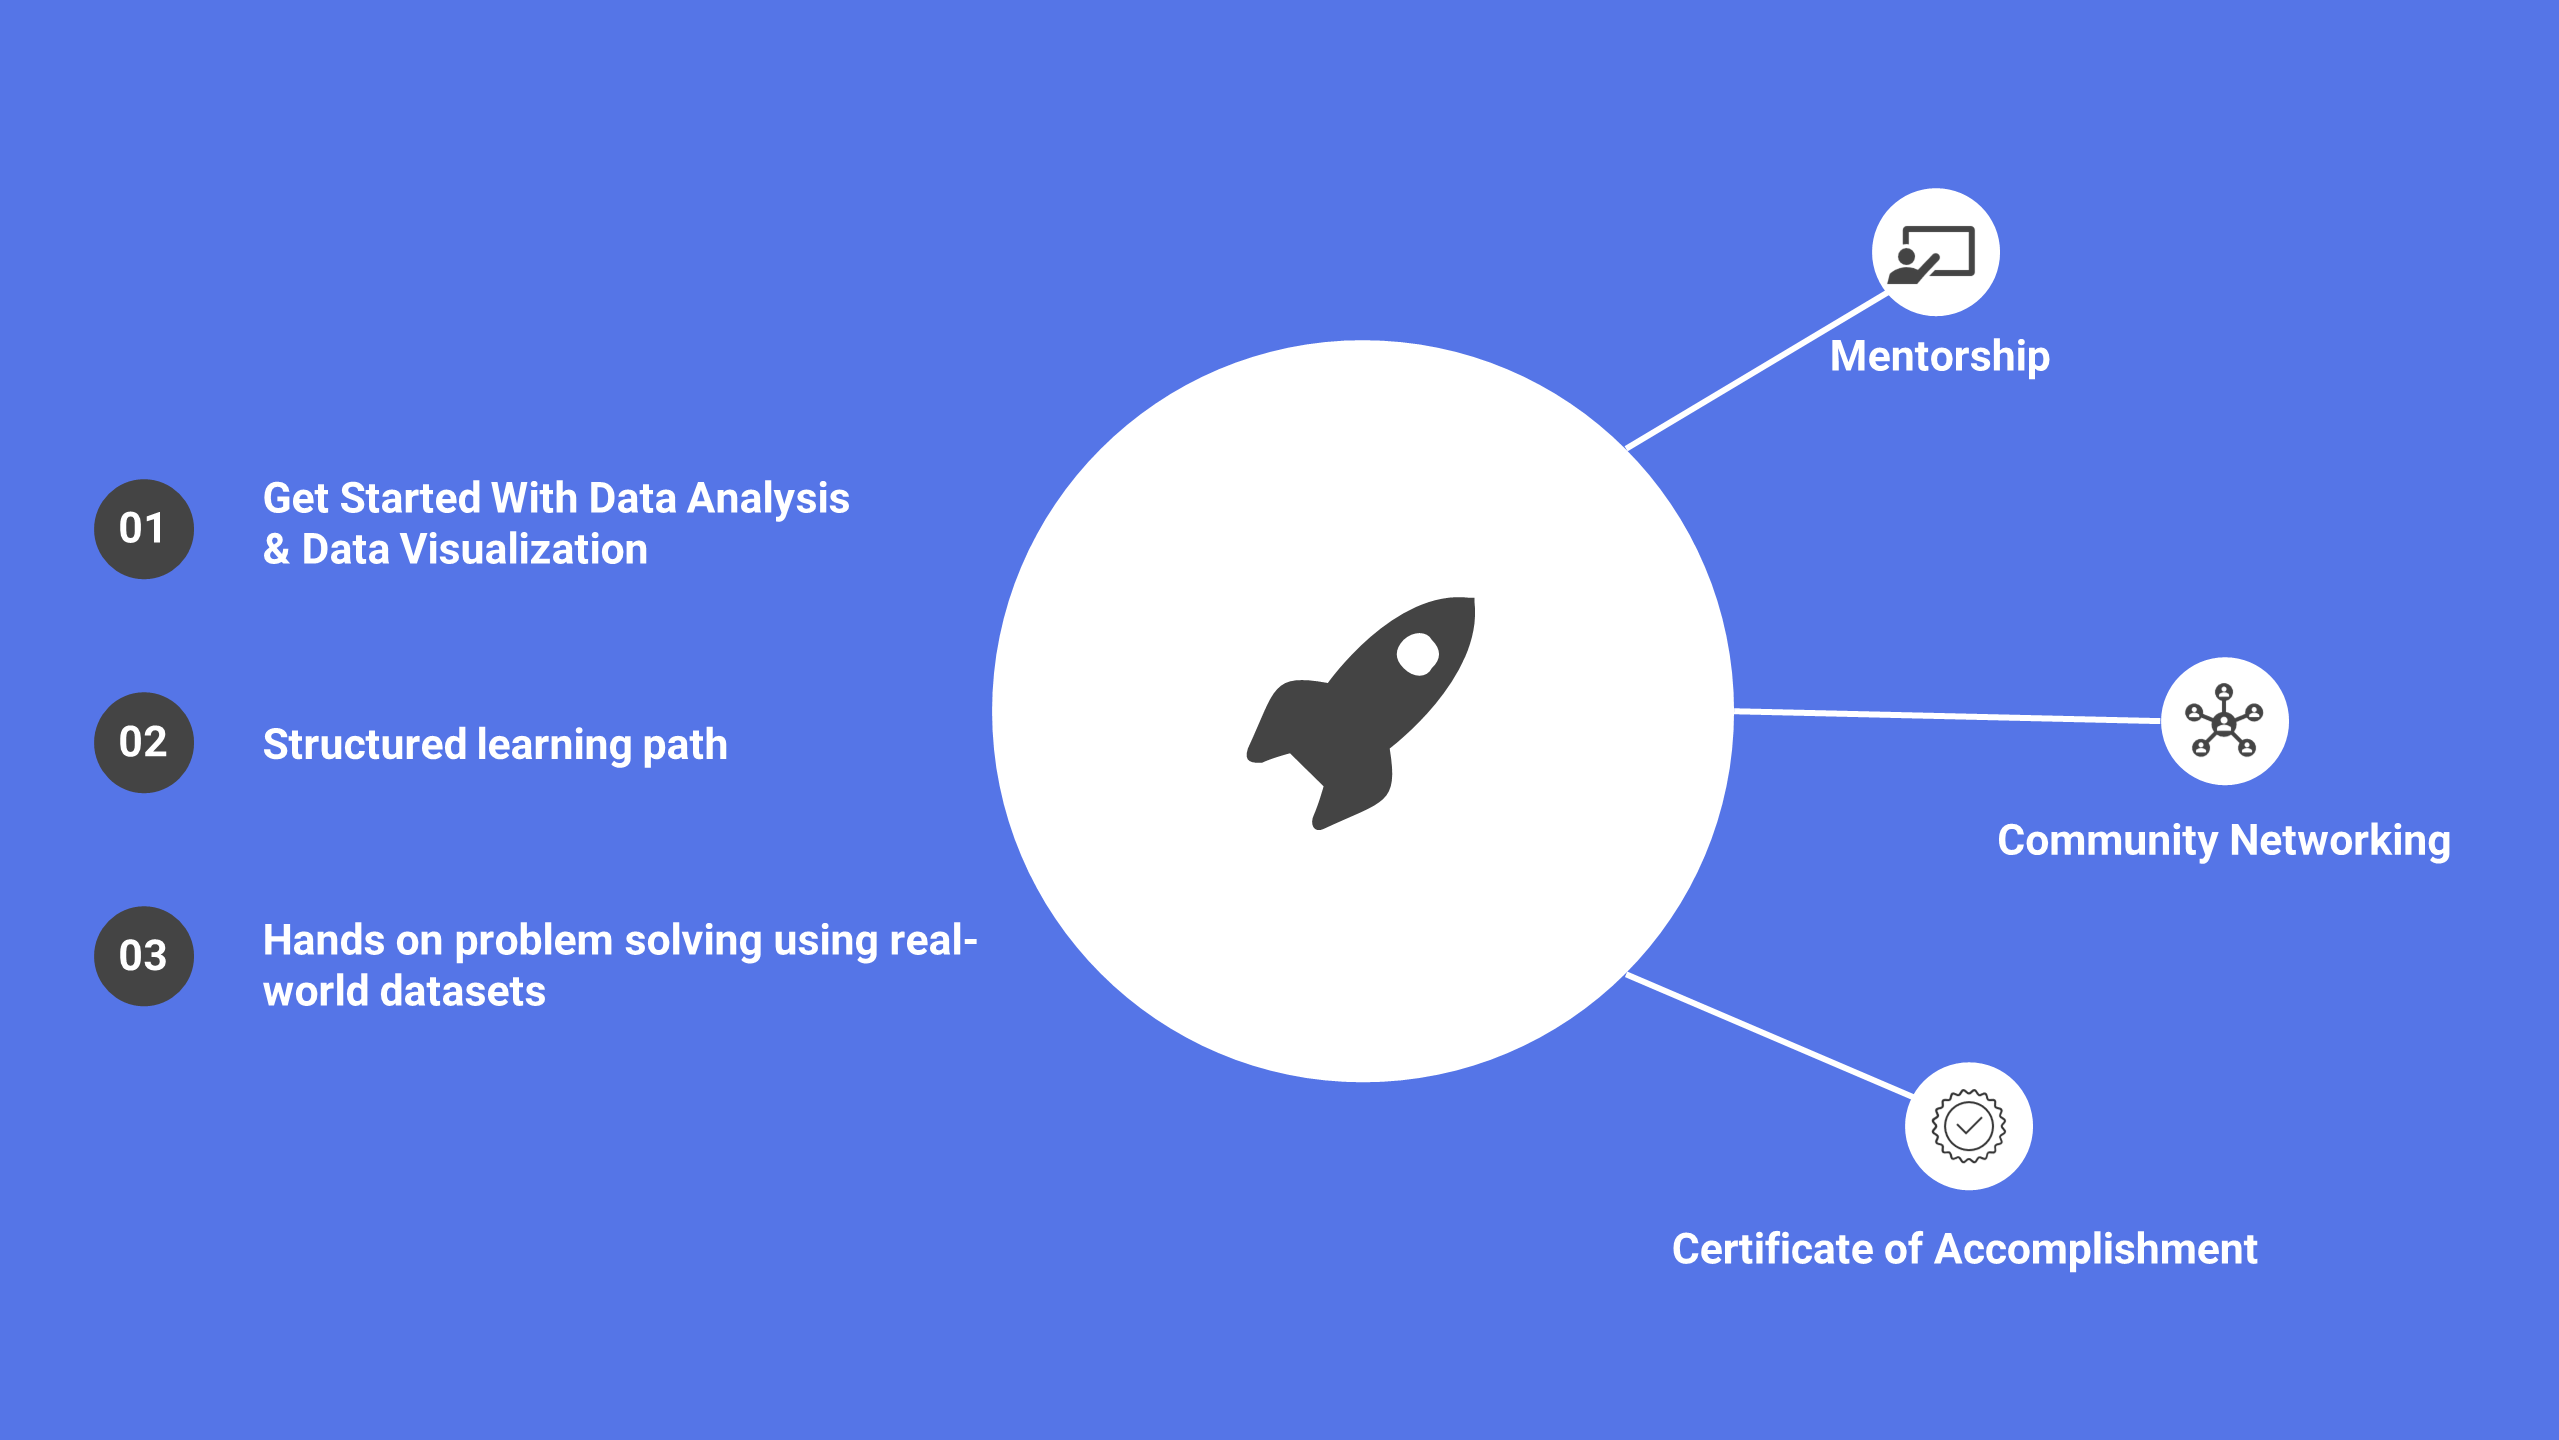 Data Analysis and Visualization 101 Bootcamp - Benefits